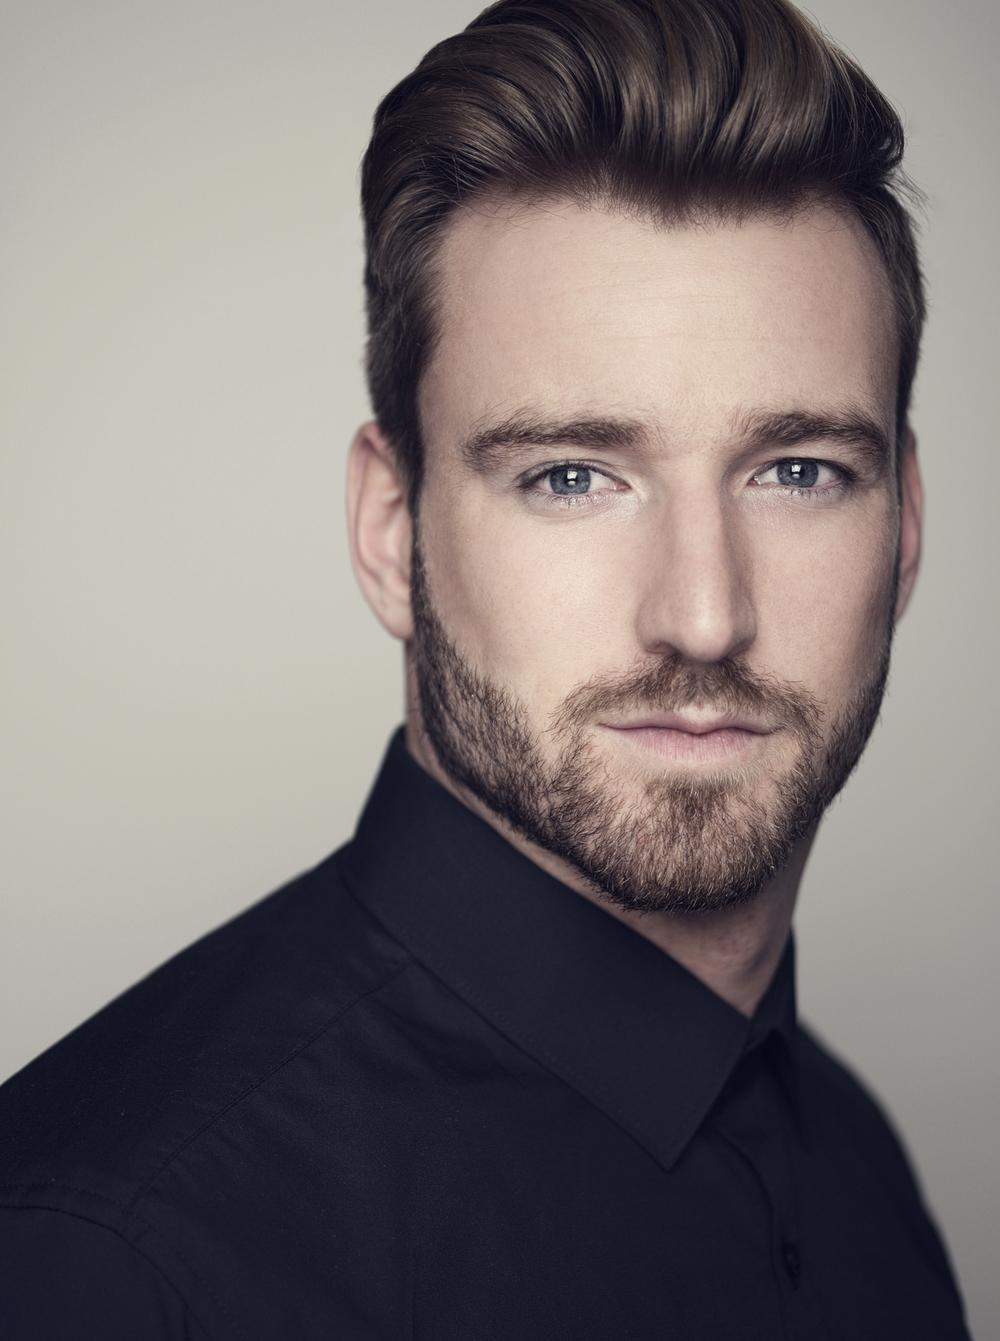 JAI McDOWALL | SINGER